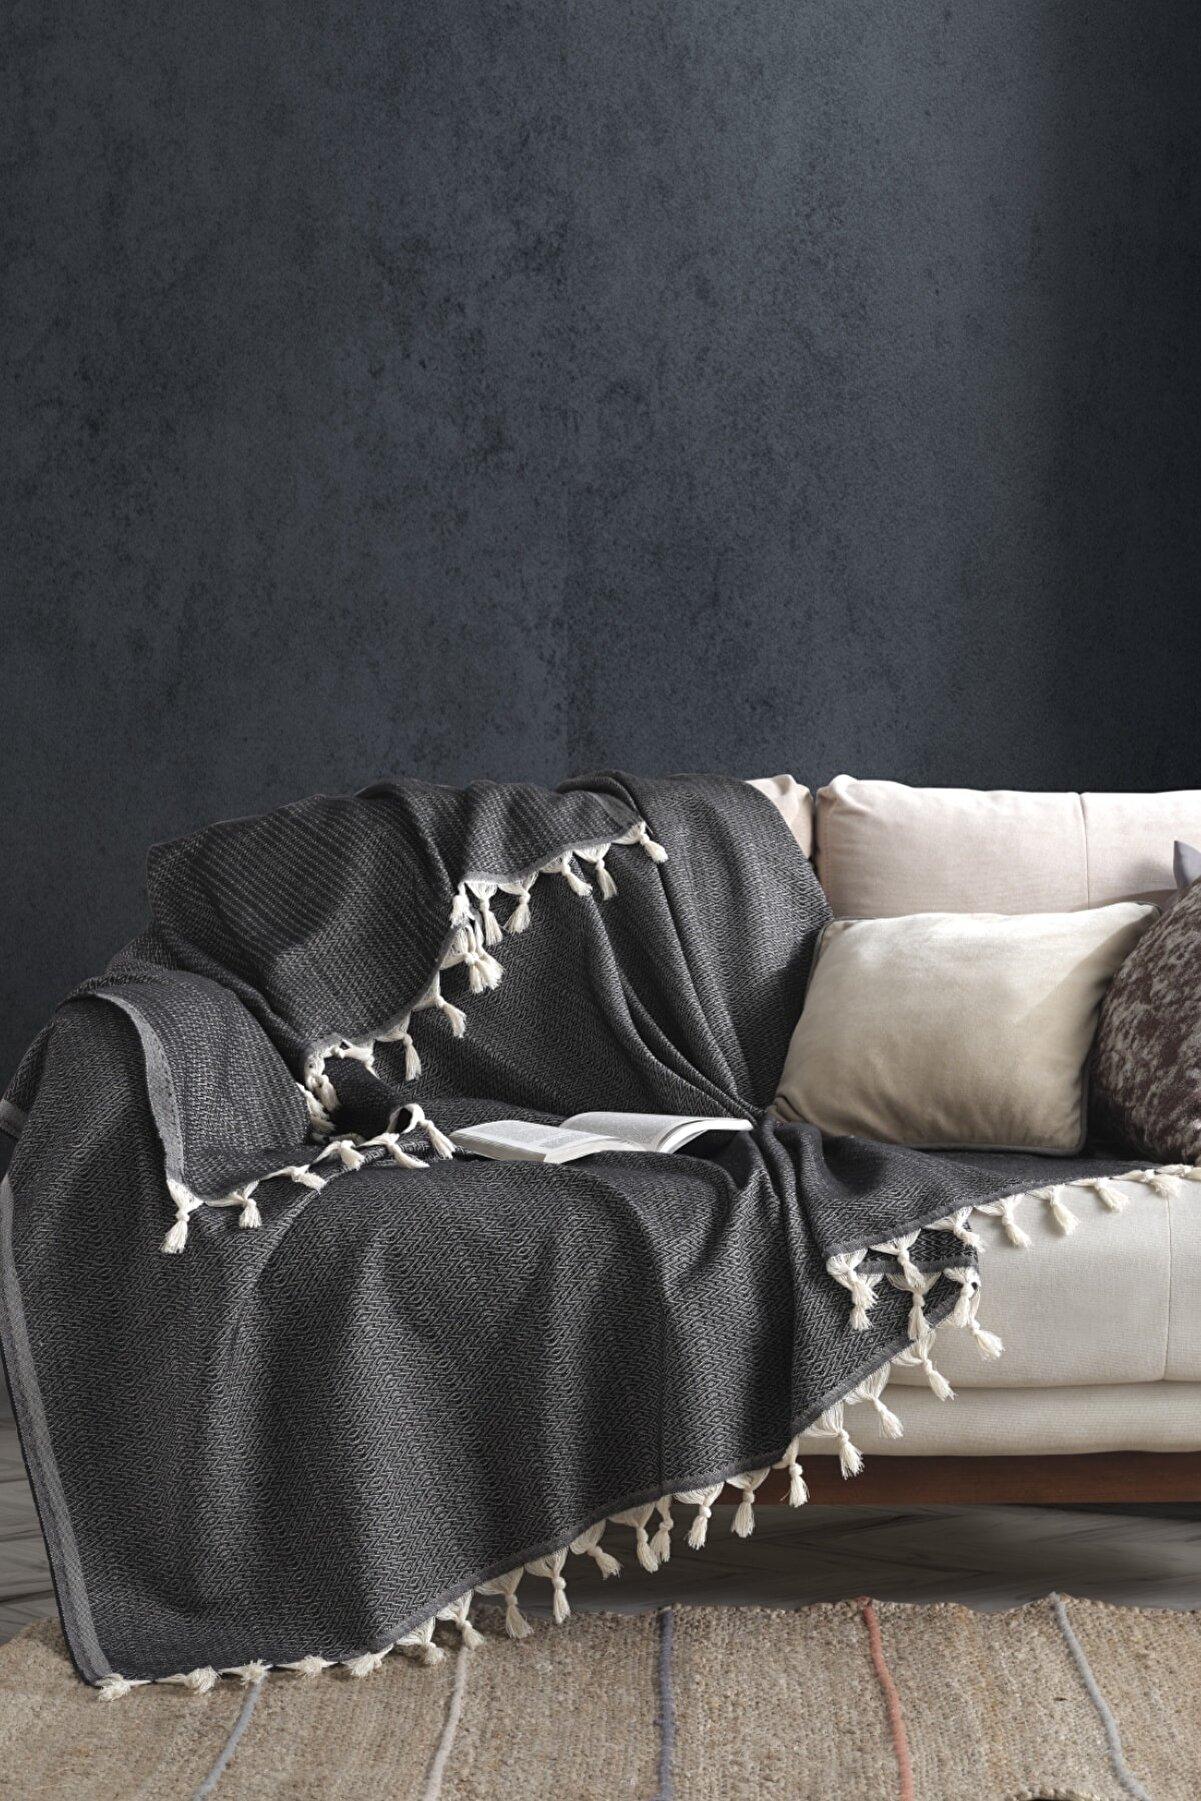 Viaden Home Natural Koltuk Örtüsü 170x230 cm Jungle - Siyah